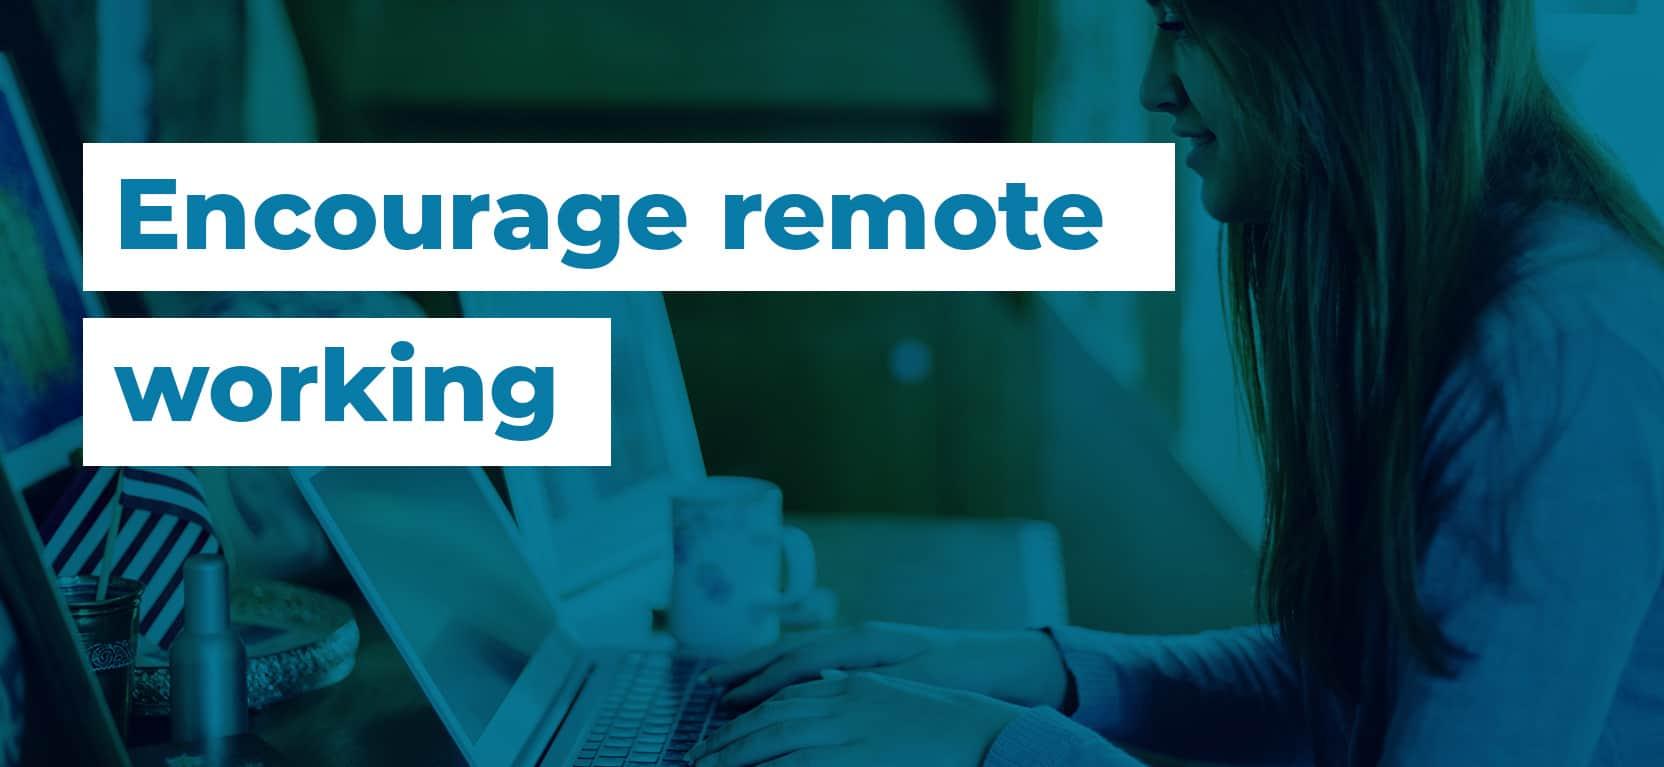 03 Encourage remote working2